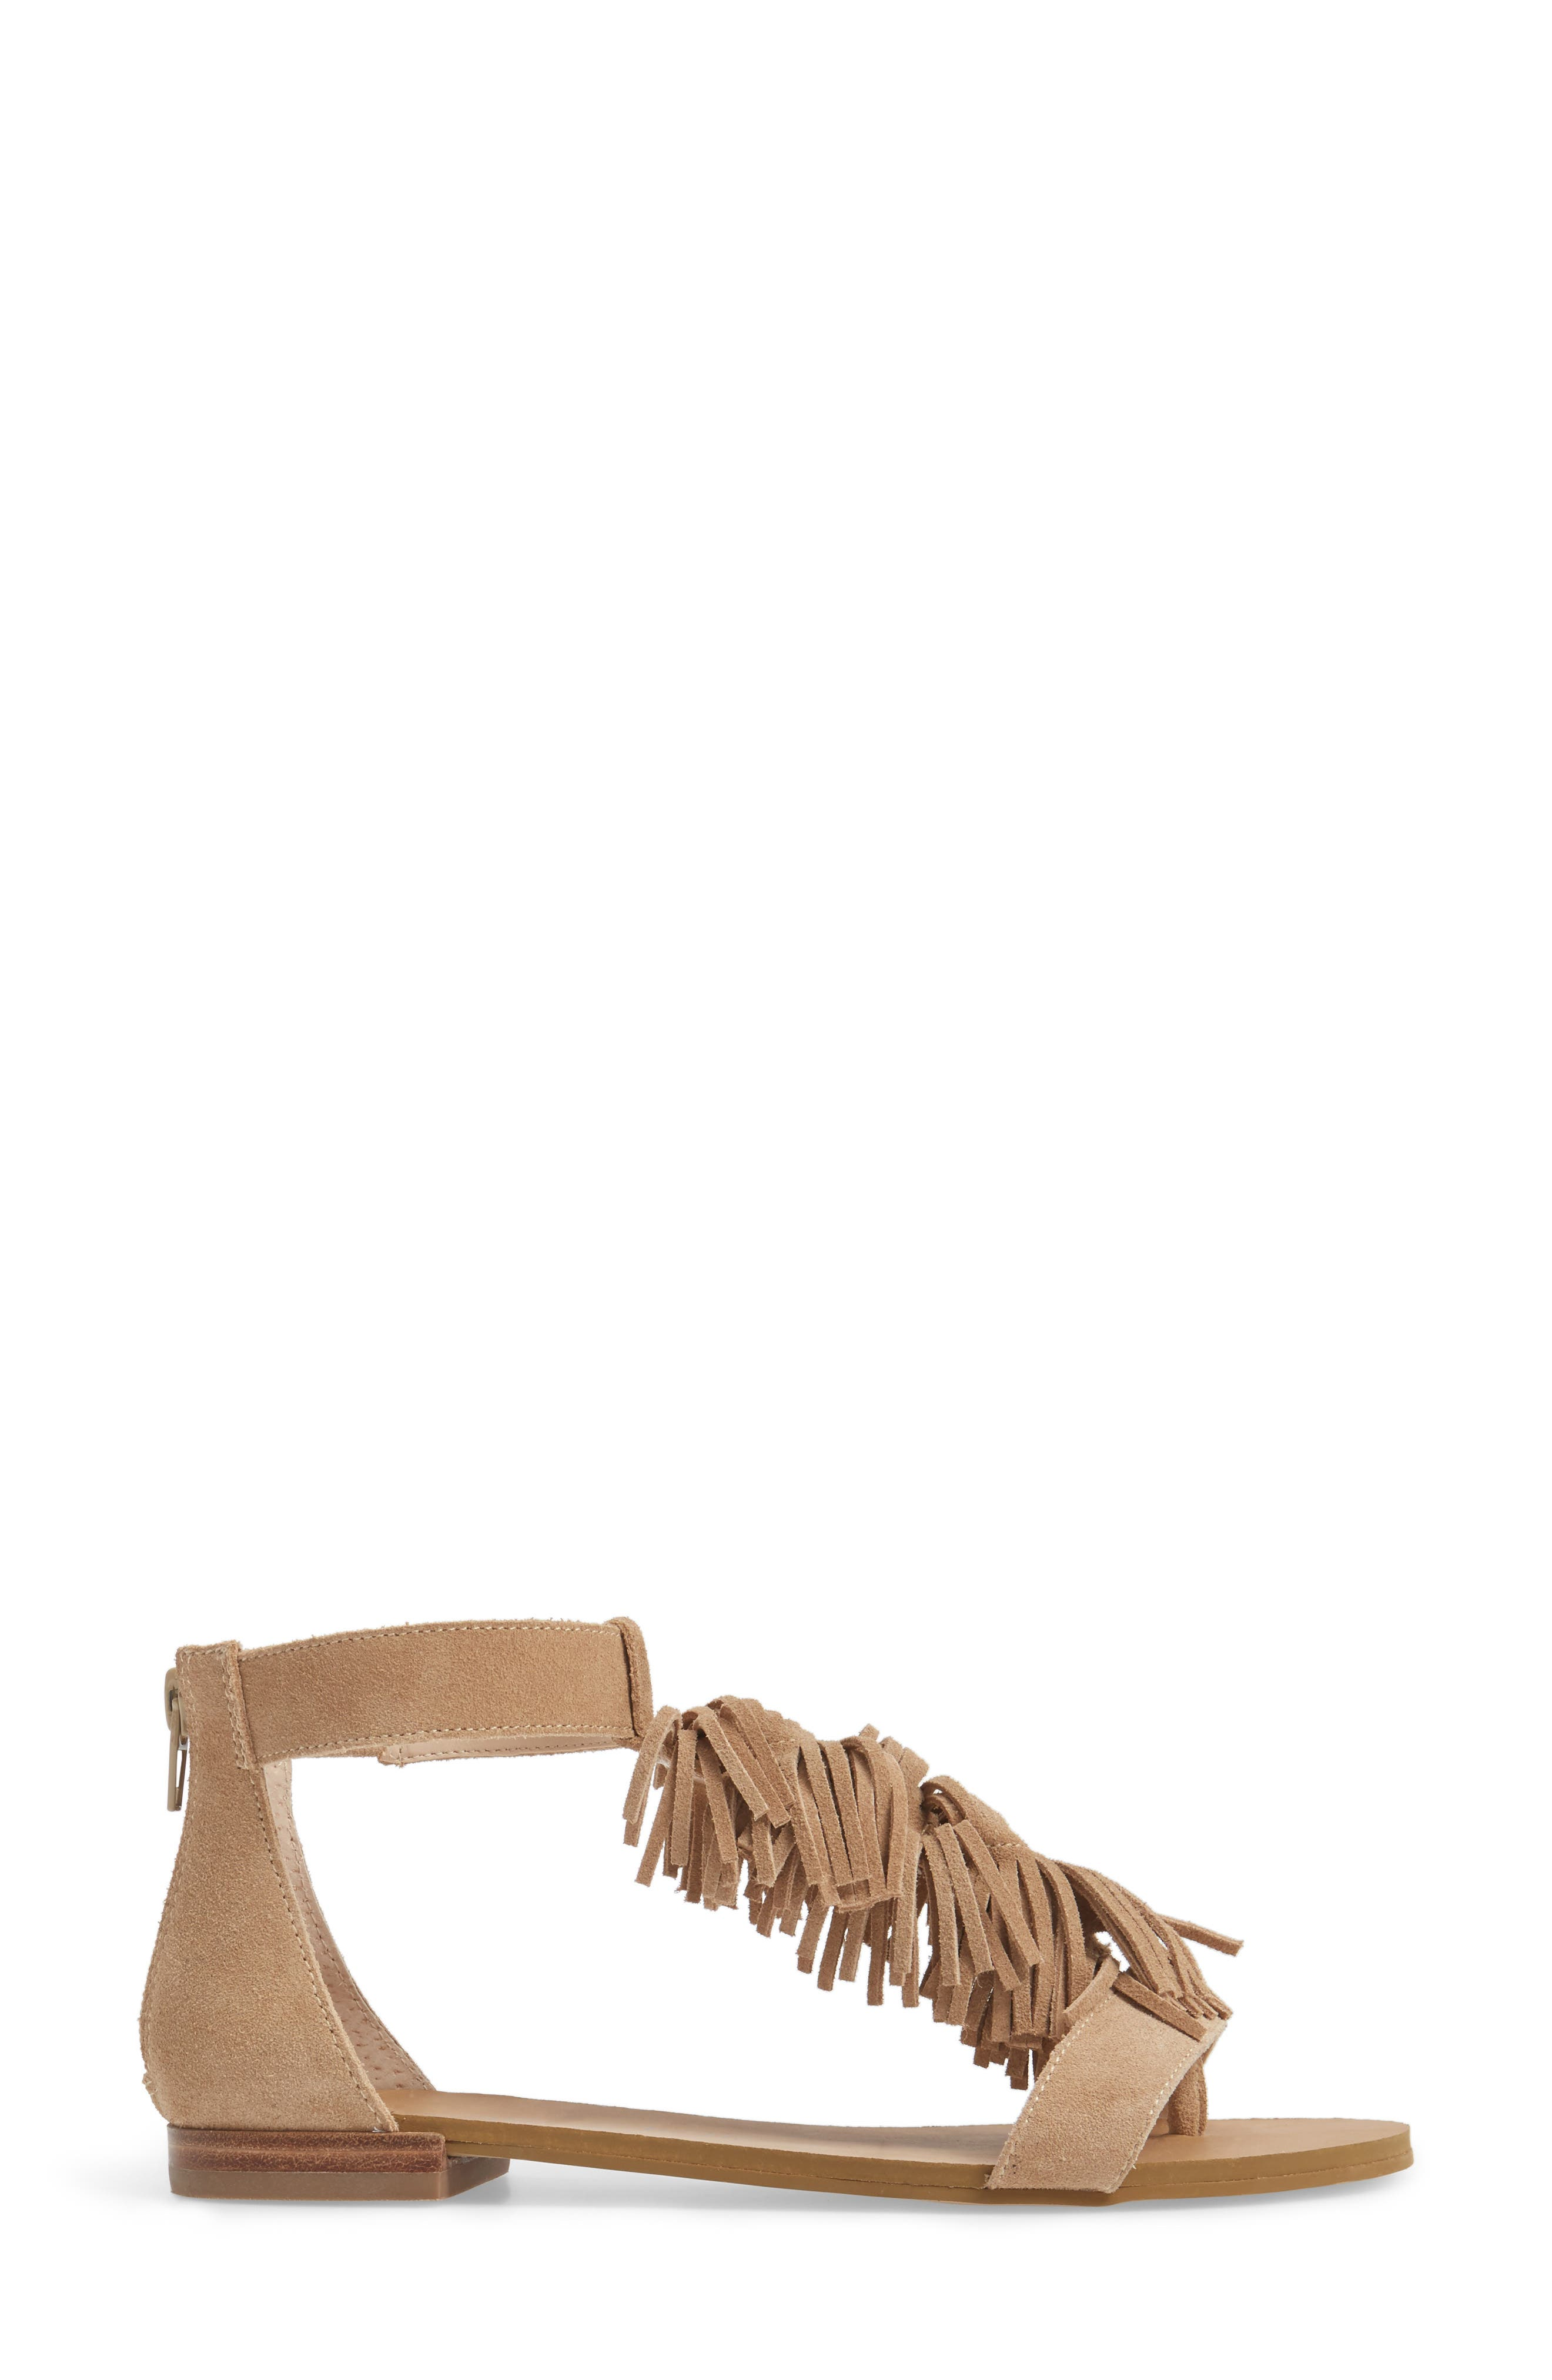 Koa Fringed T-Strap Sandal,                             Alternate thumbnail 3, color,                             200